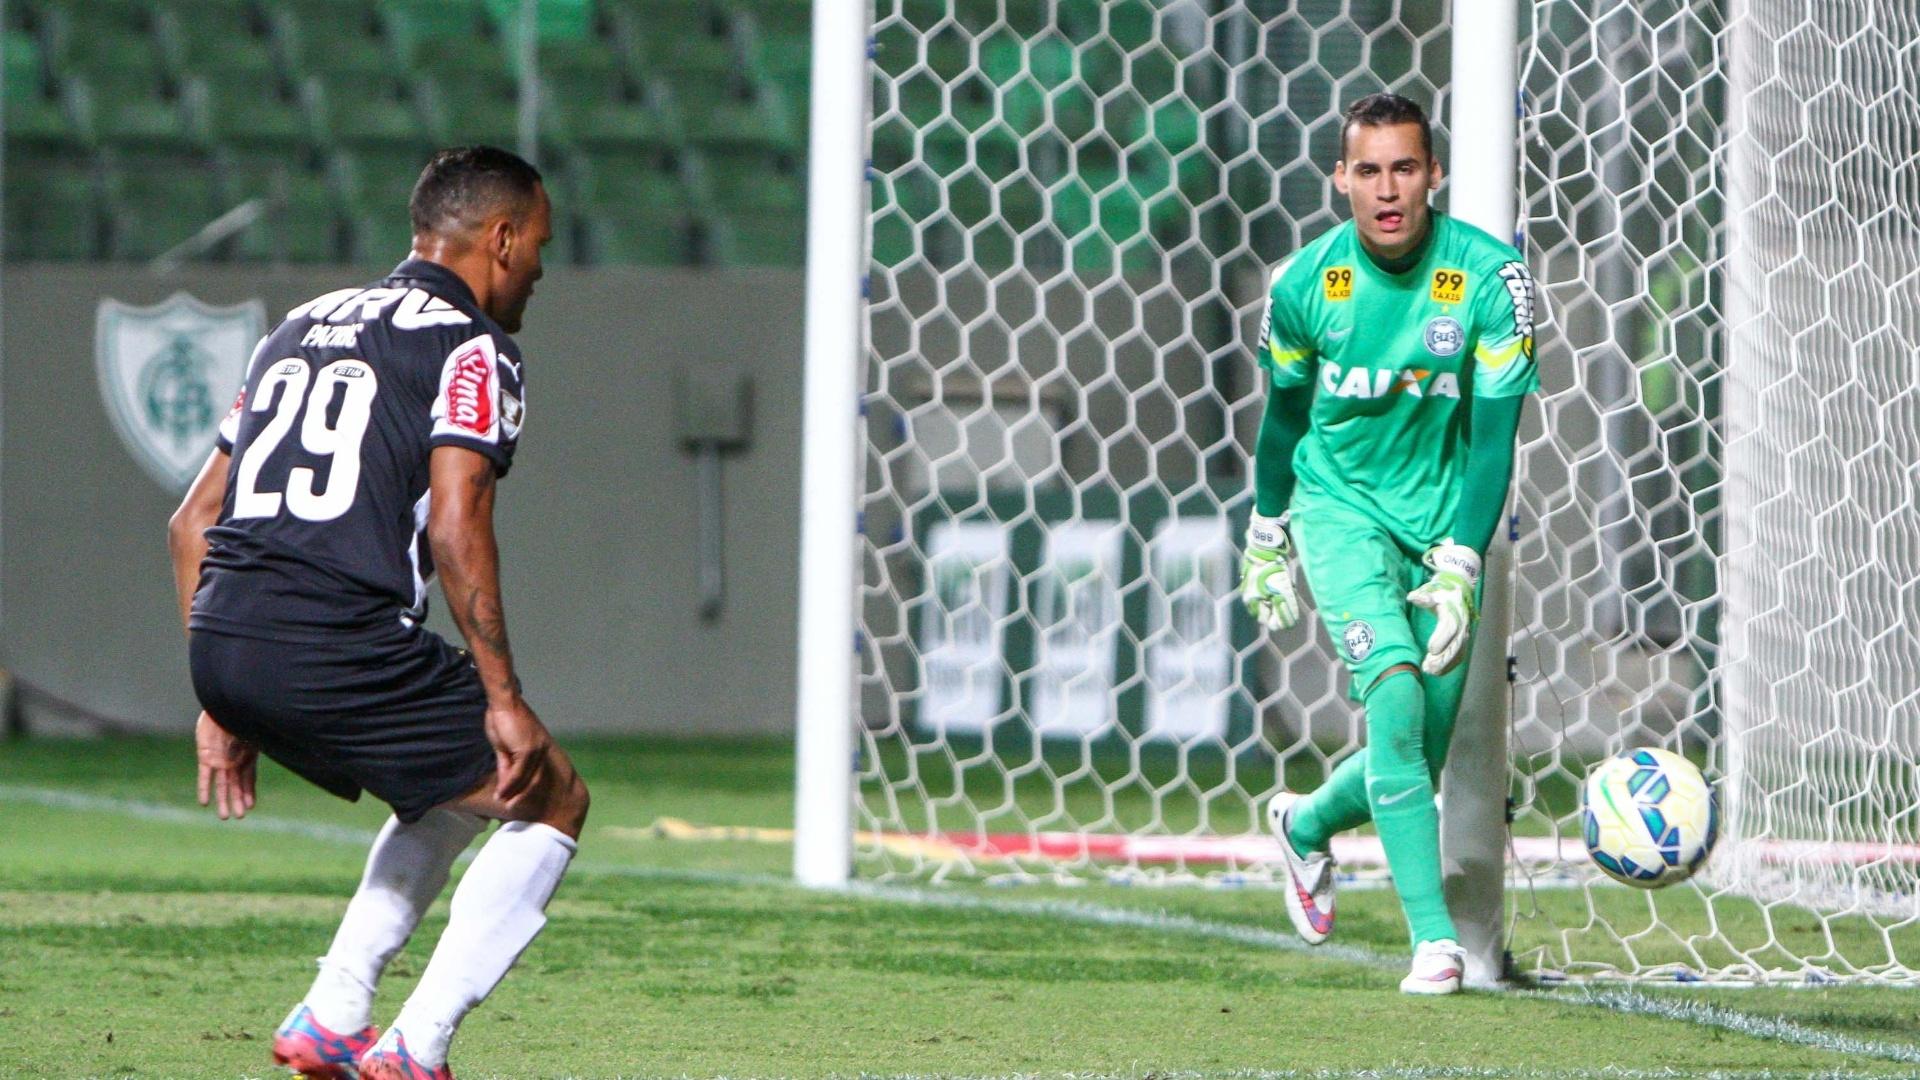 Patric se prepara para finalizar na partida entre Atlético-MG e Coritiba